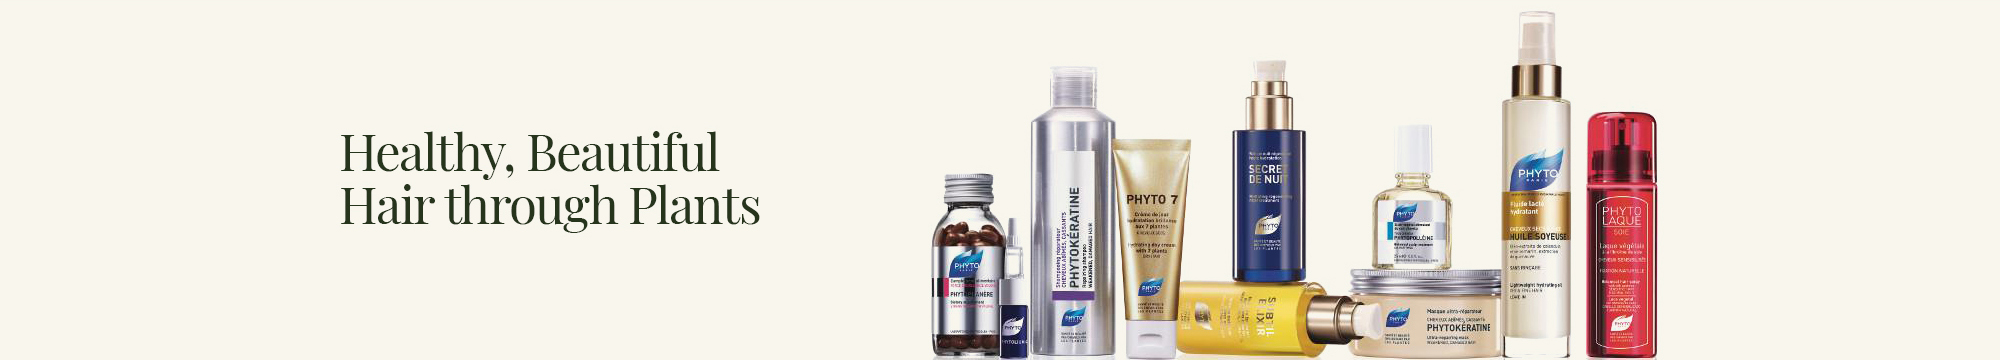 Phyto-Haircare-Treatment